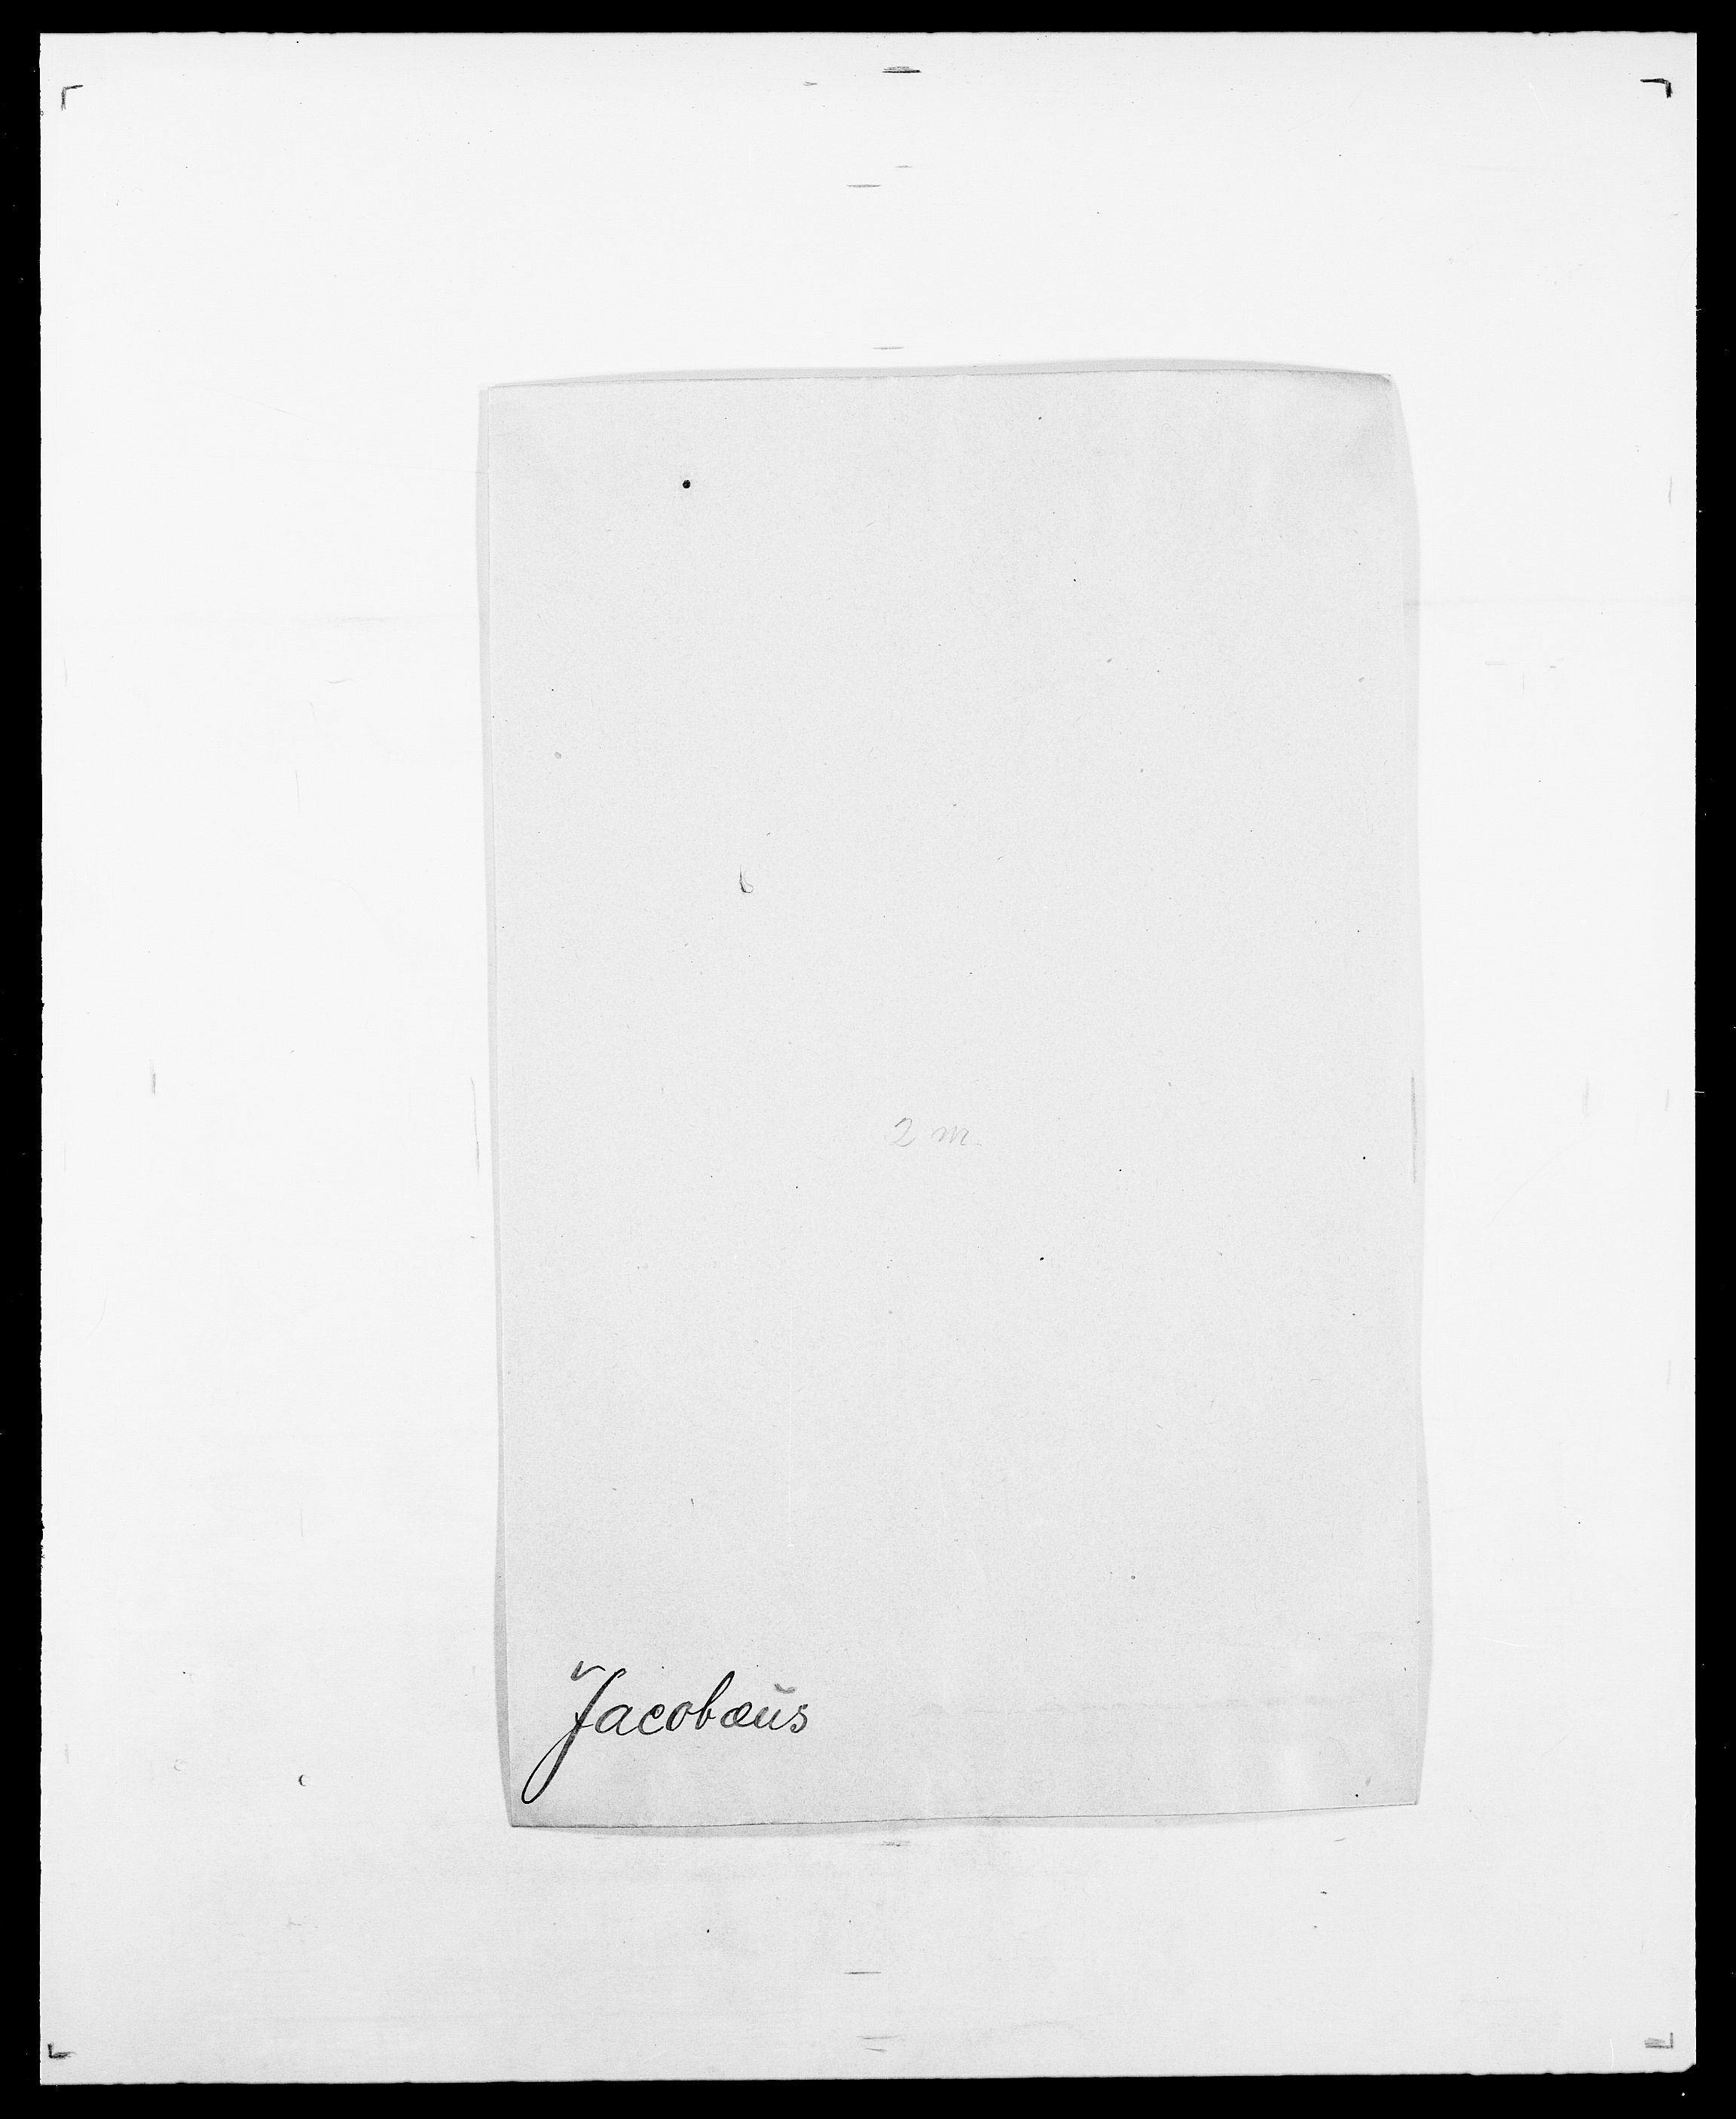 SAO, Delgobe, Charles Antoine - samling, D/Da/L0019: van der Hude - Joys, s. 514